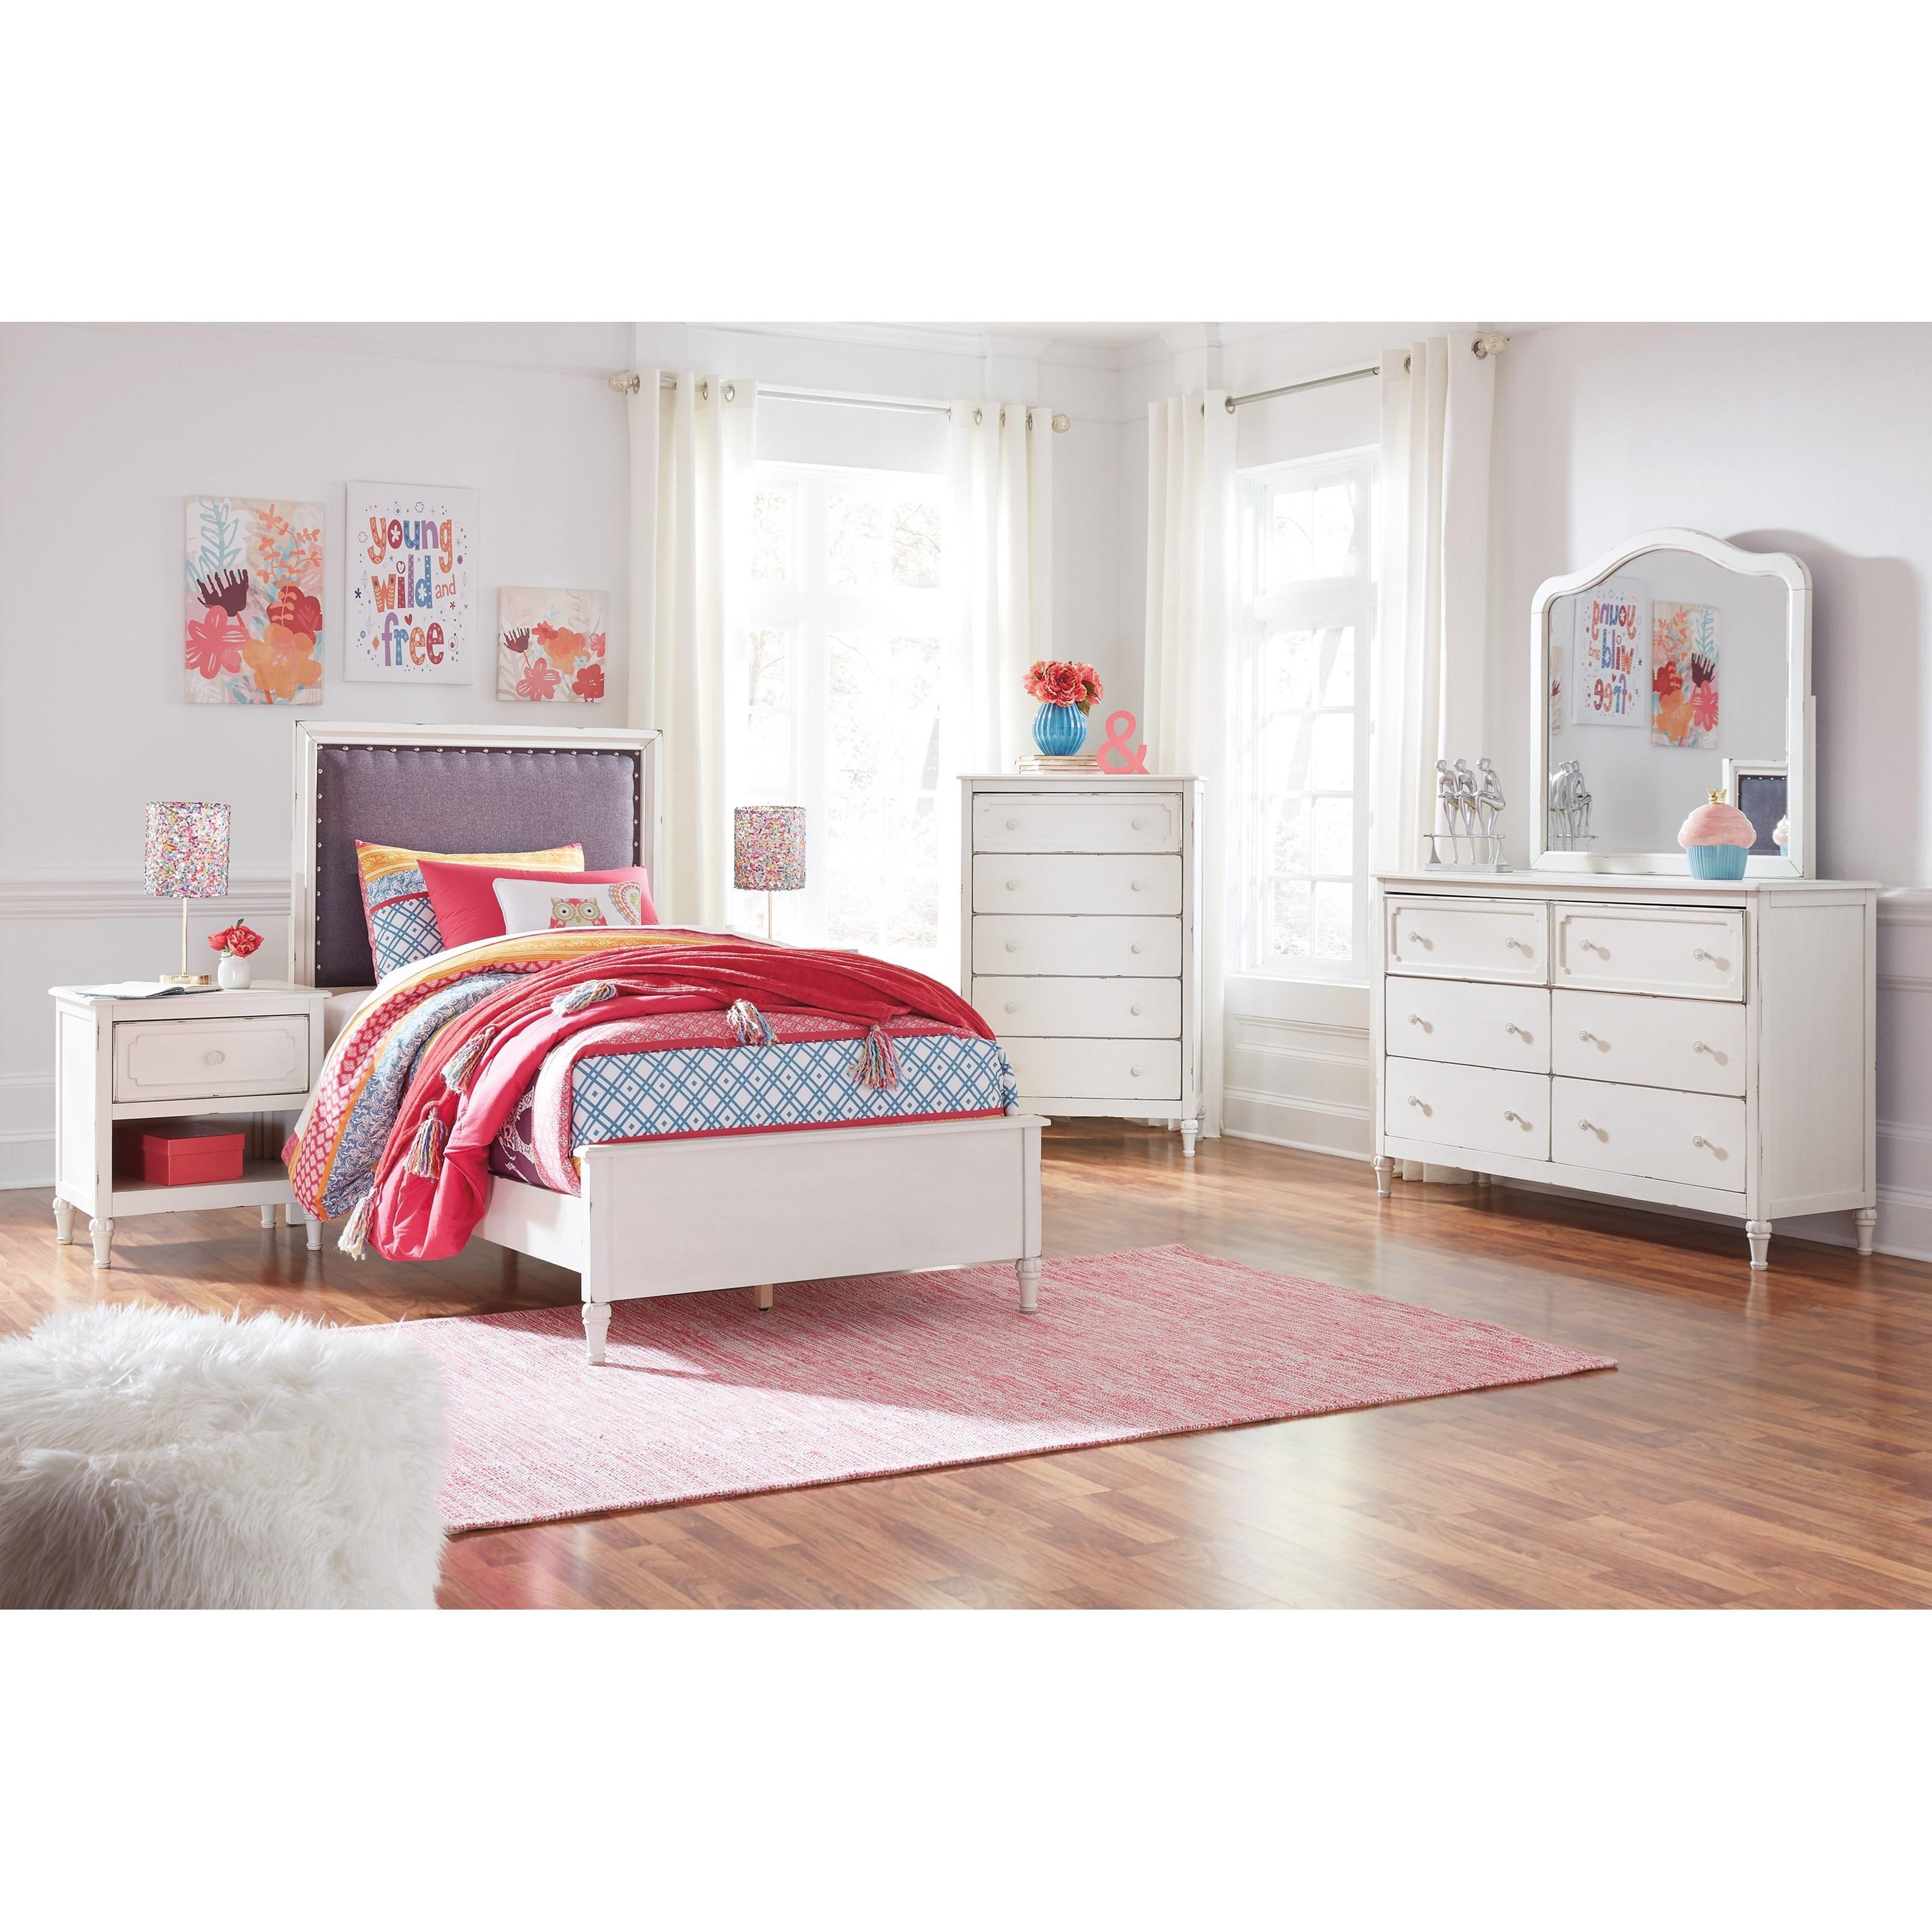 Ashley Furniture Manufacturer: Signature Design By Ashley Faelene Relaxed Vintage 1